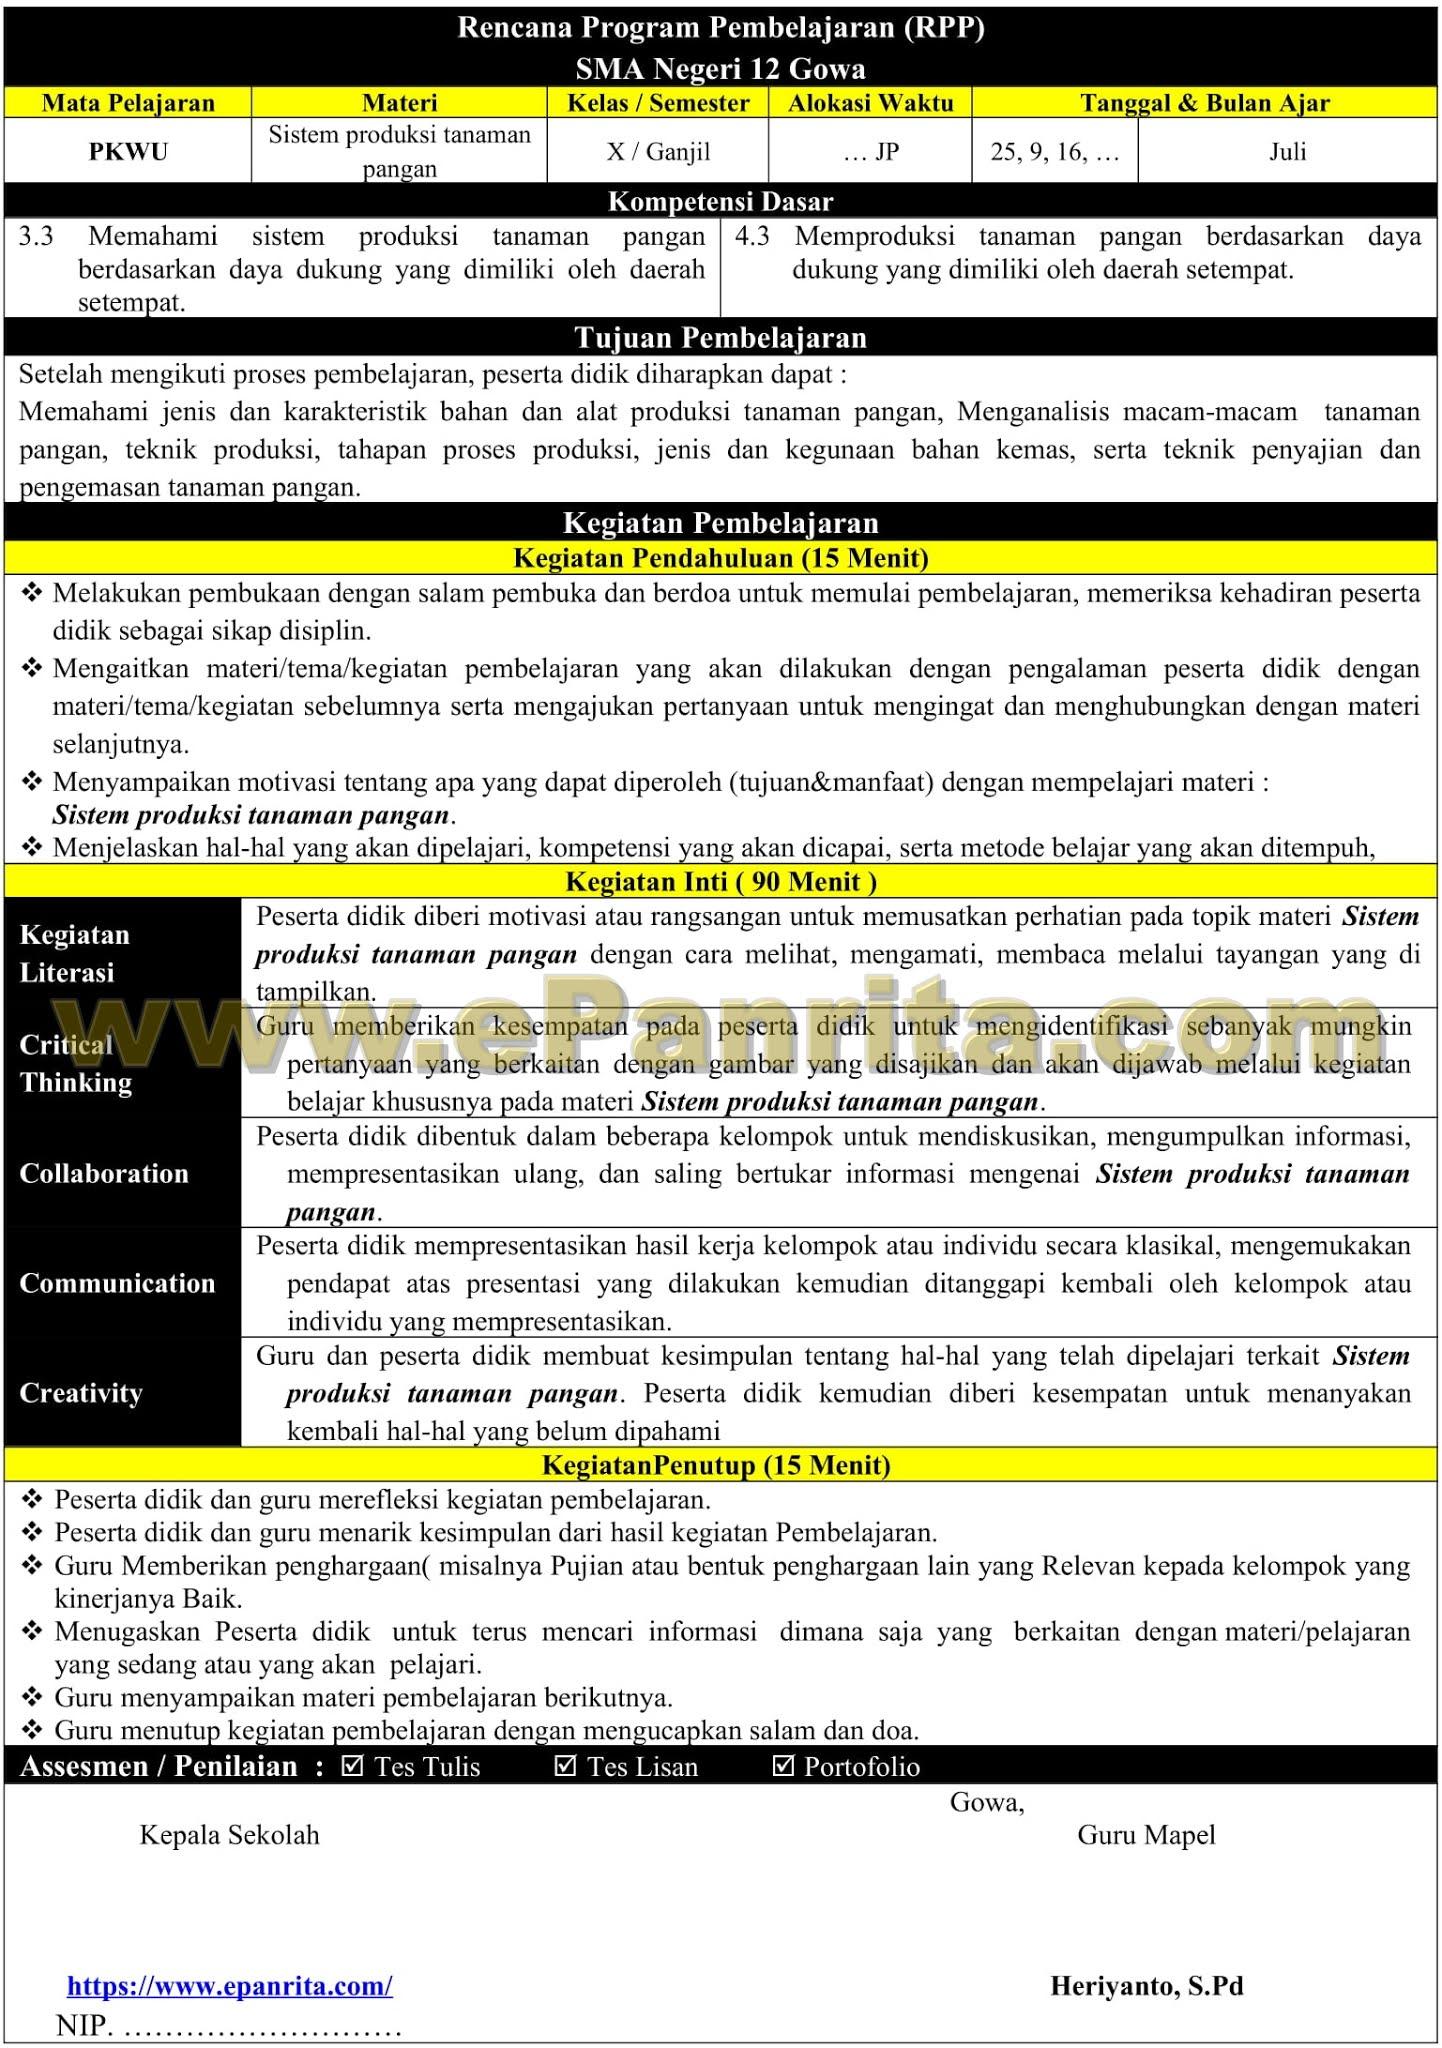 RPP 1 Halaman Prakarya Aspek Budidaya (Sistem produksi tanaman pangan)